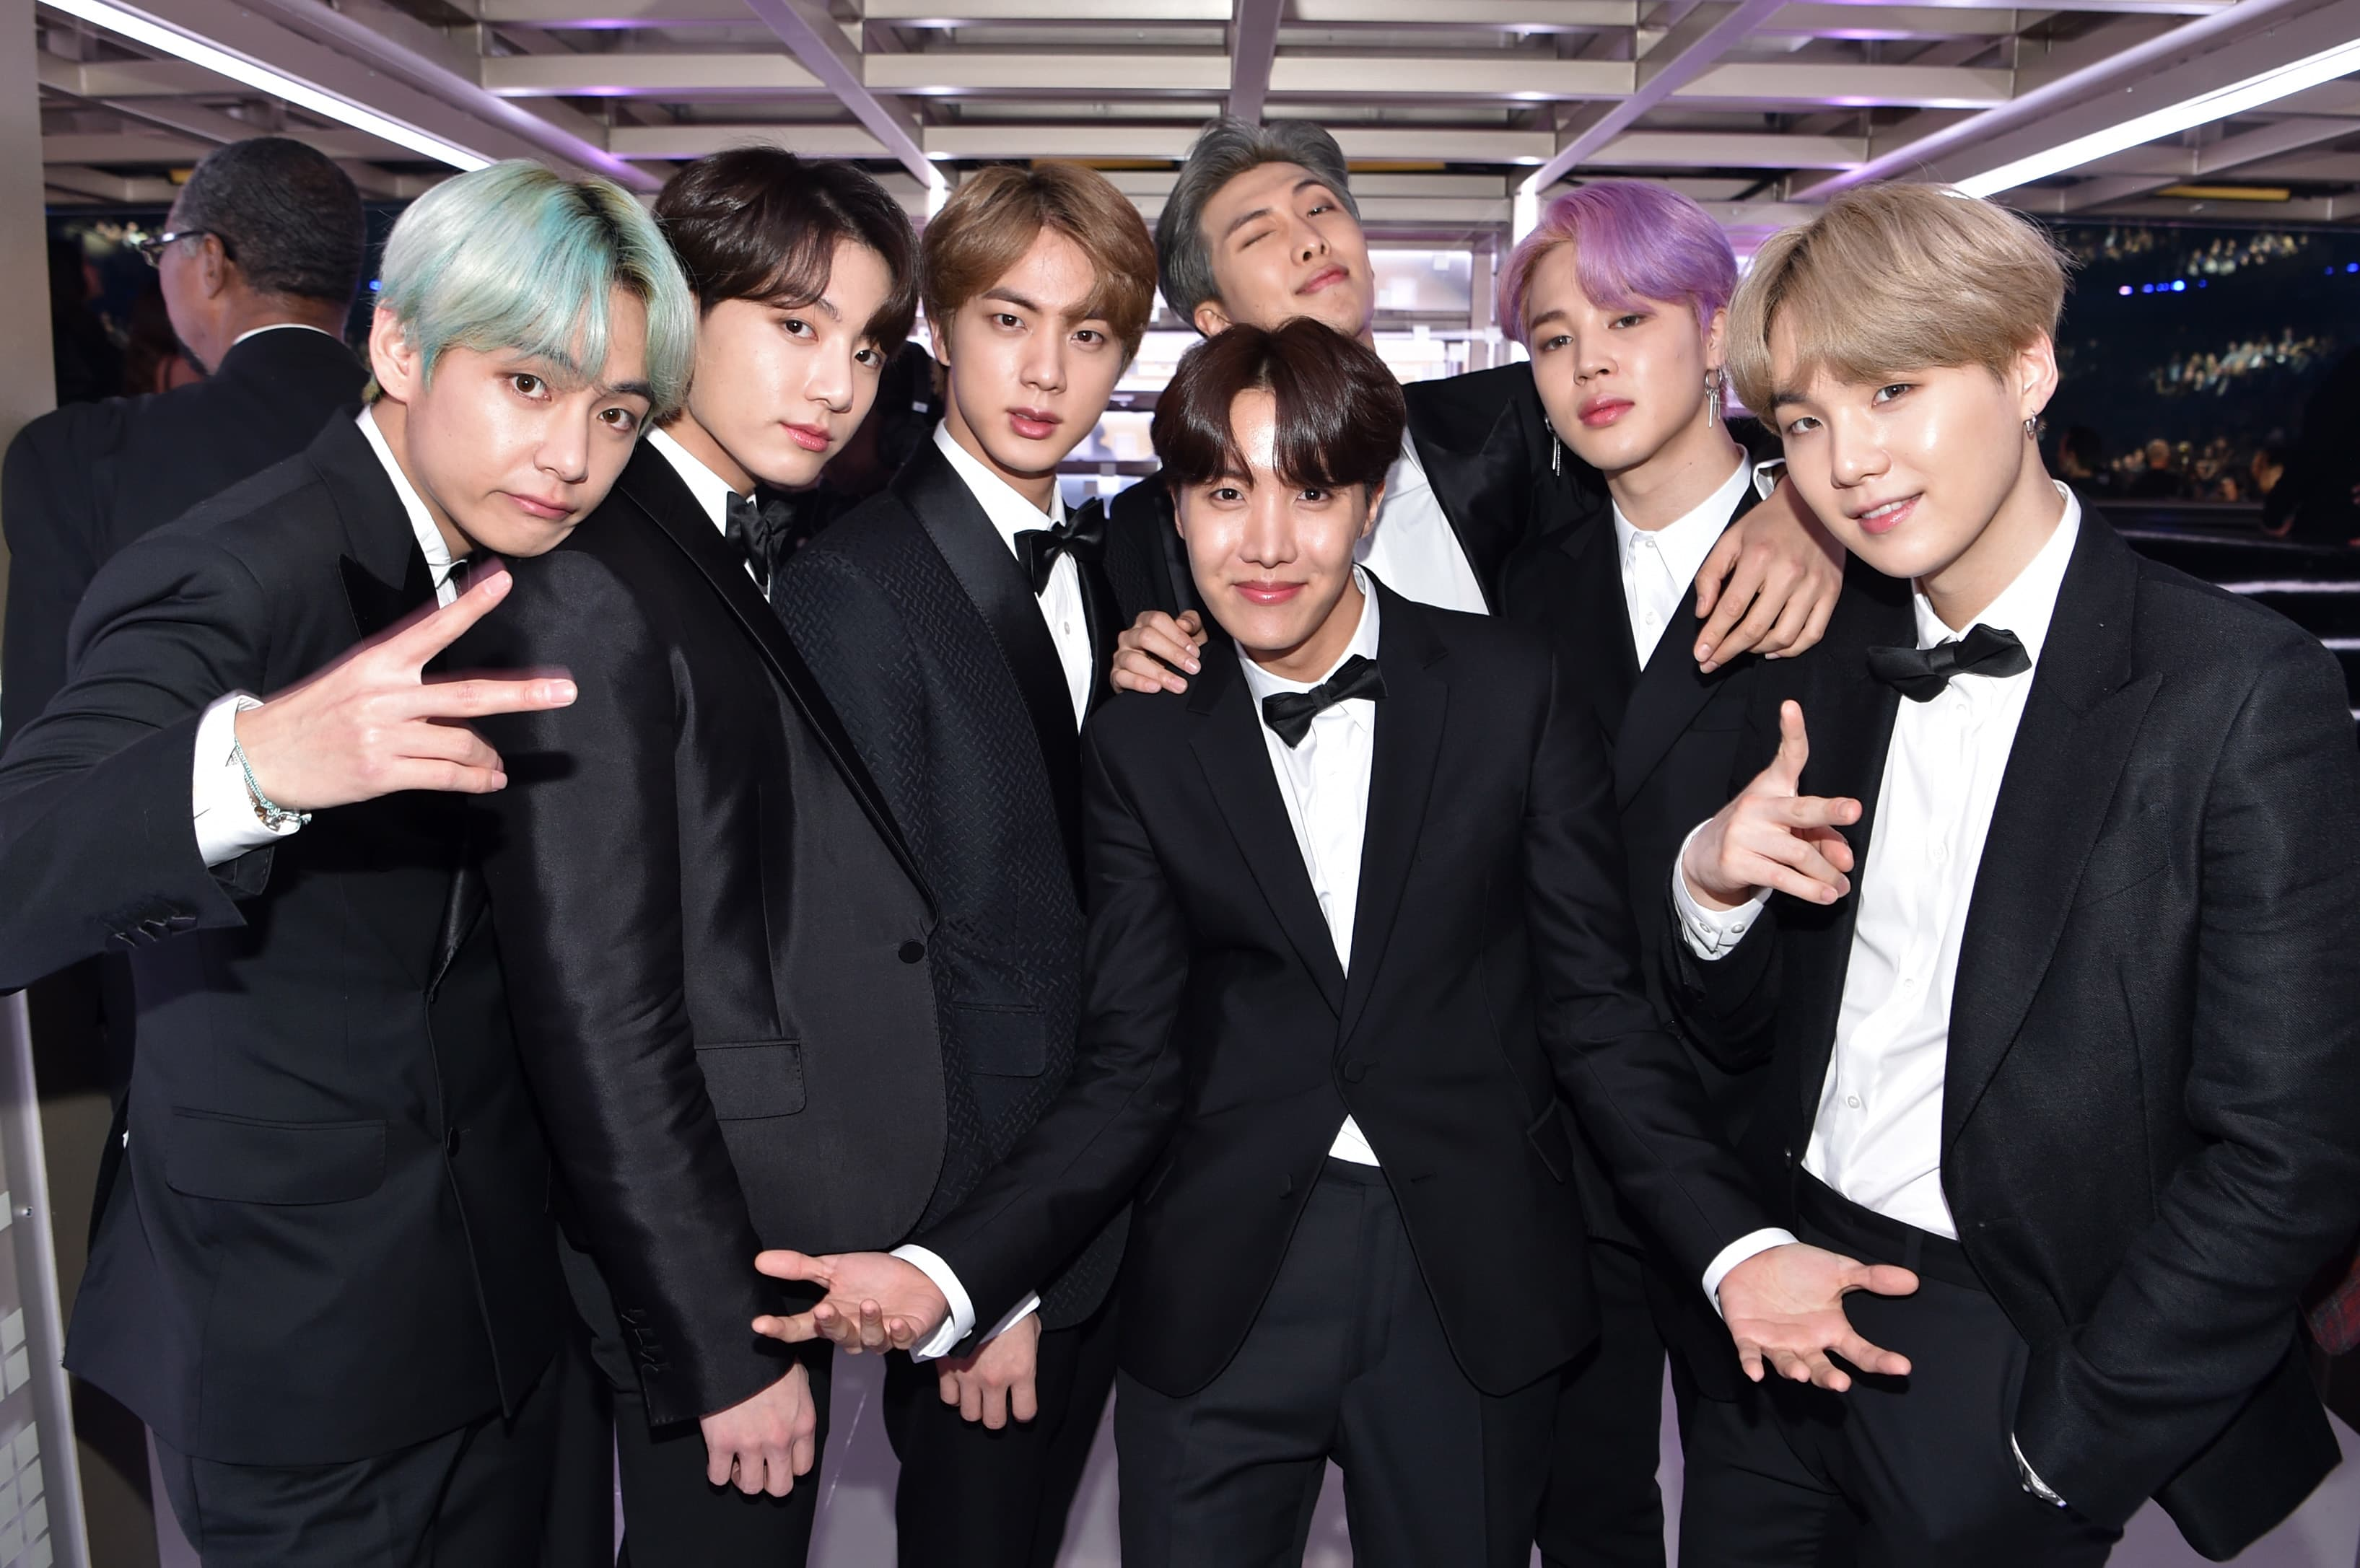 South Korean boyband BTS has to do military service